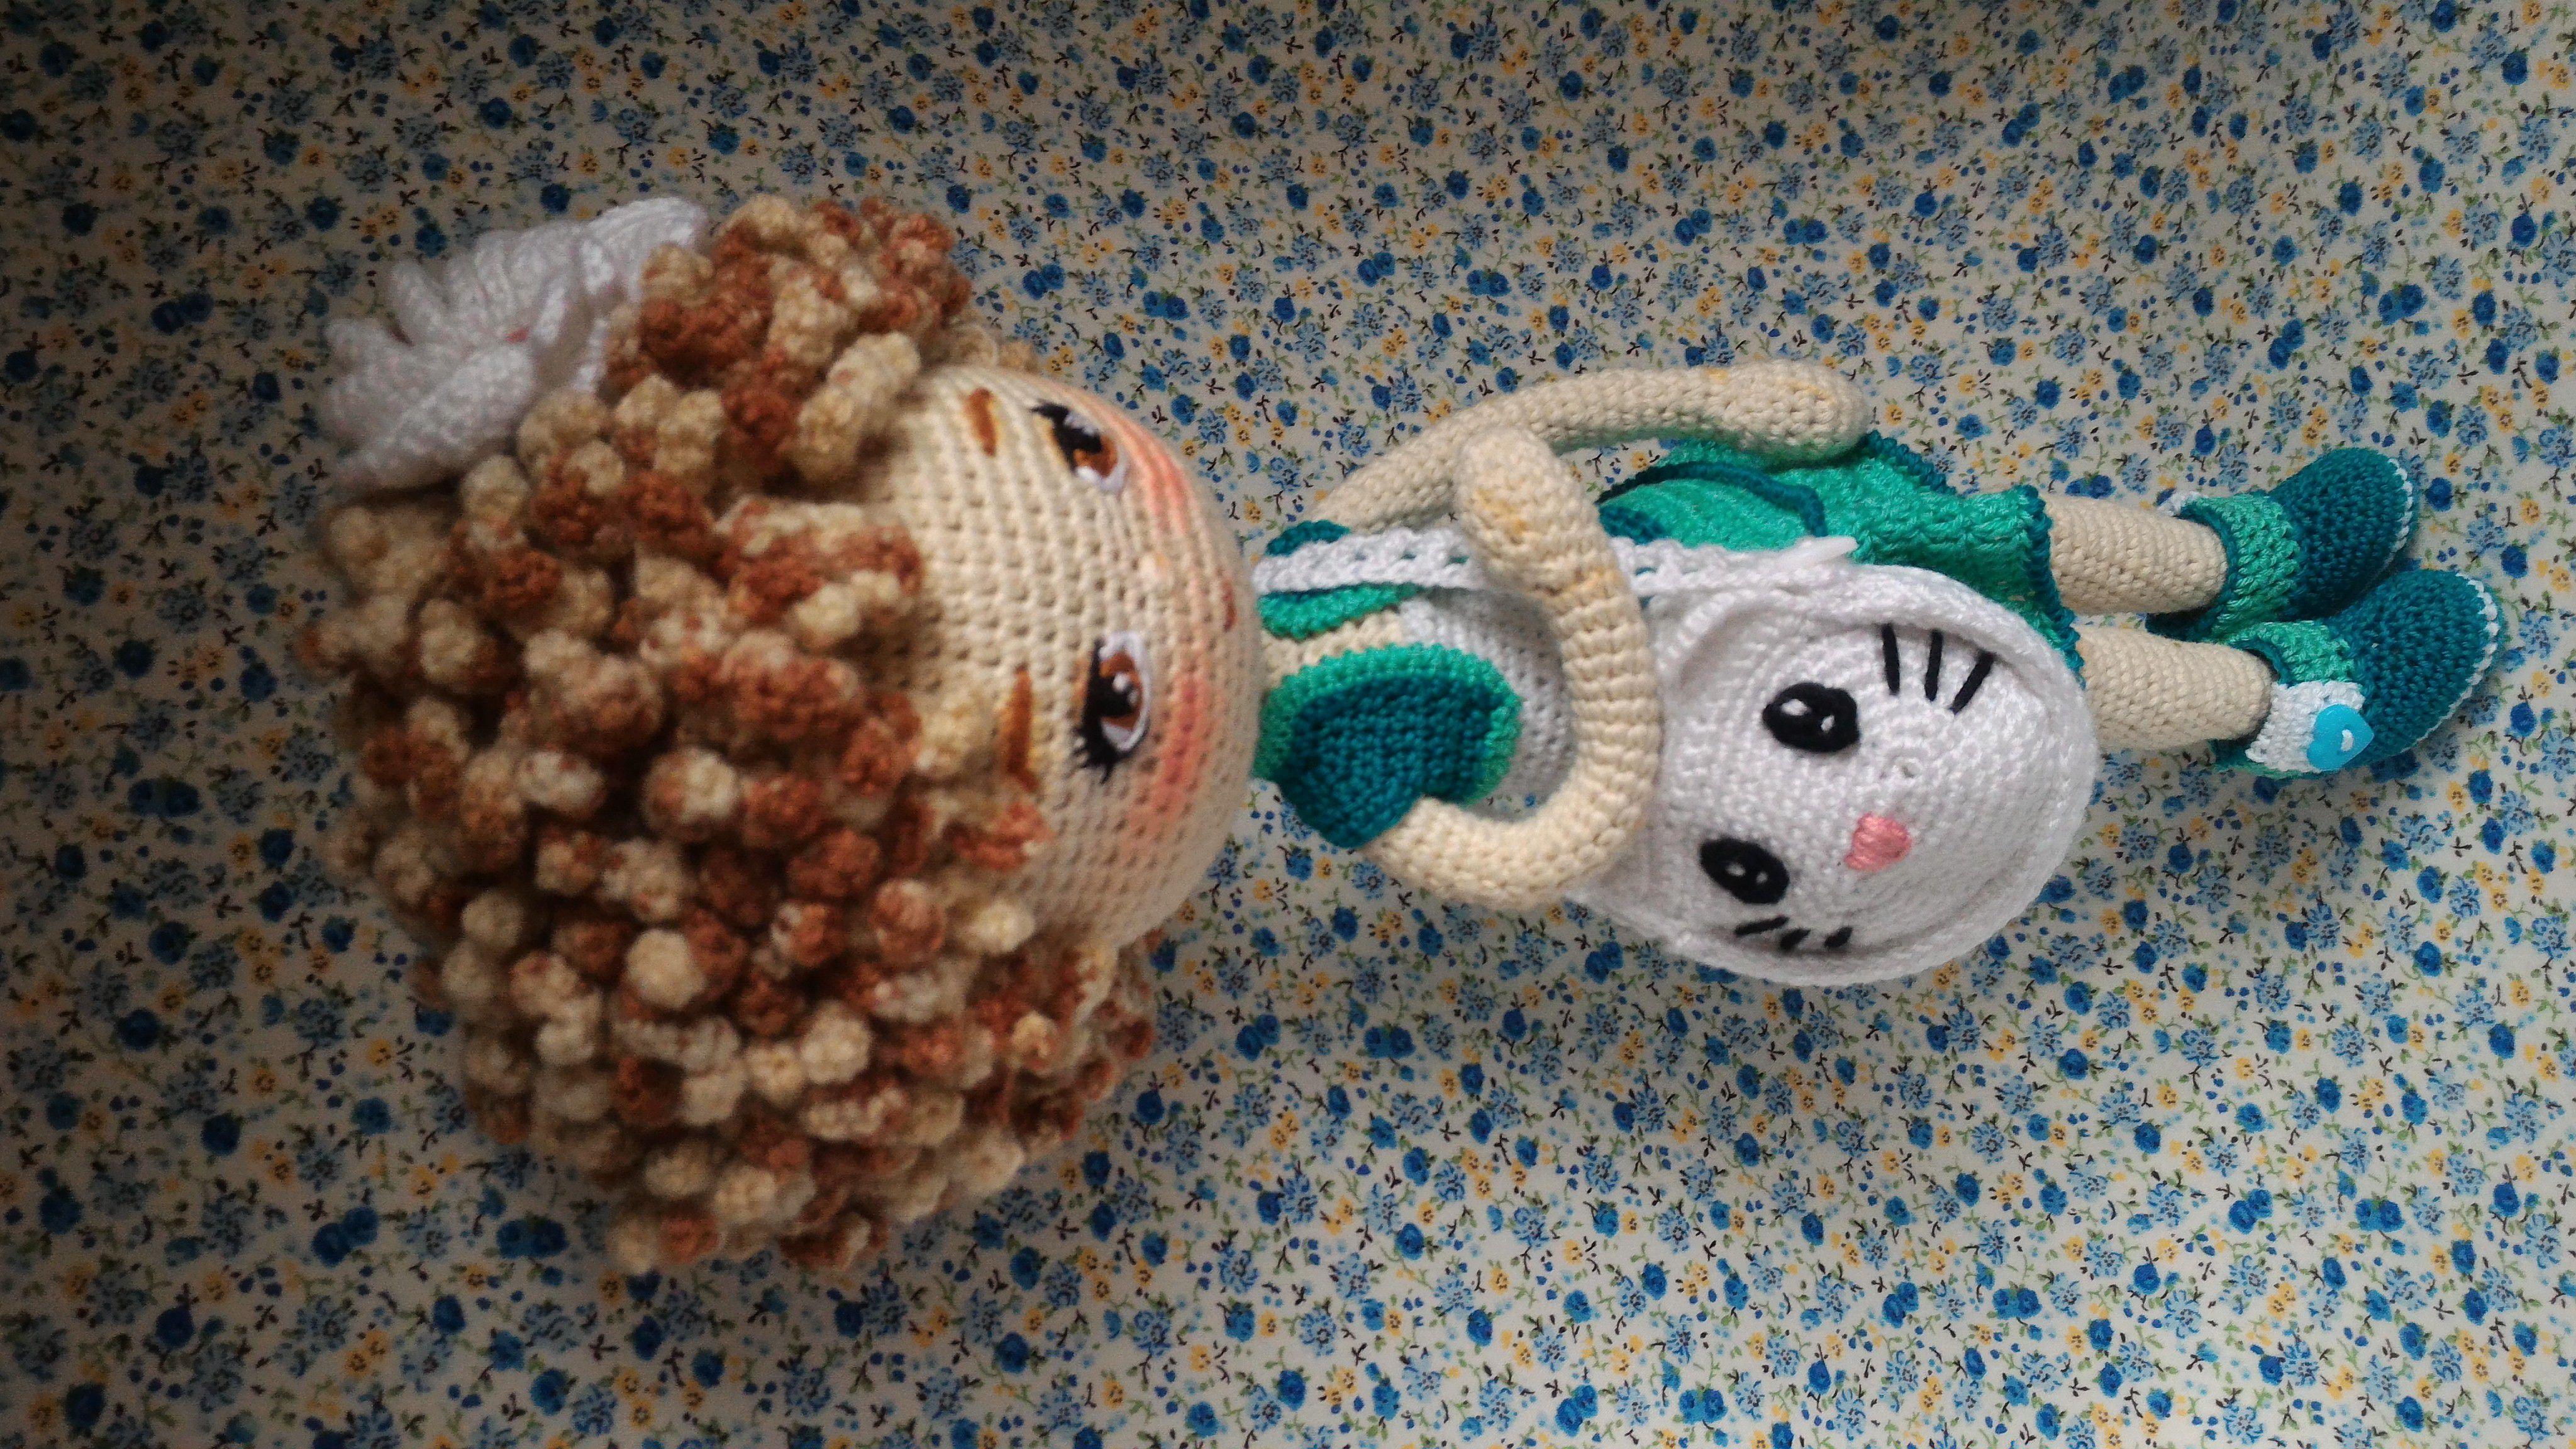 подарки крючком работы ручной семинарами амтгуруми заказ кукла игрушки